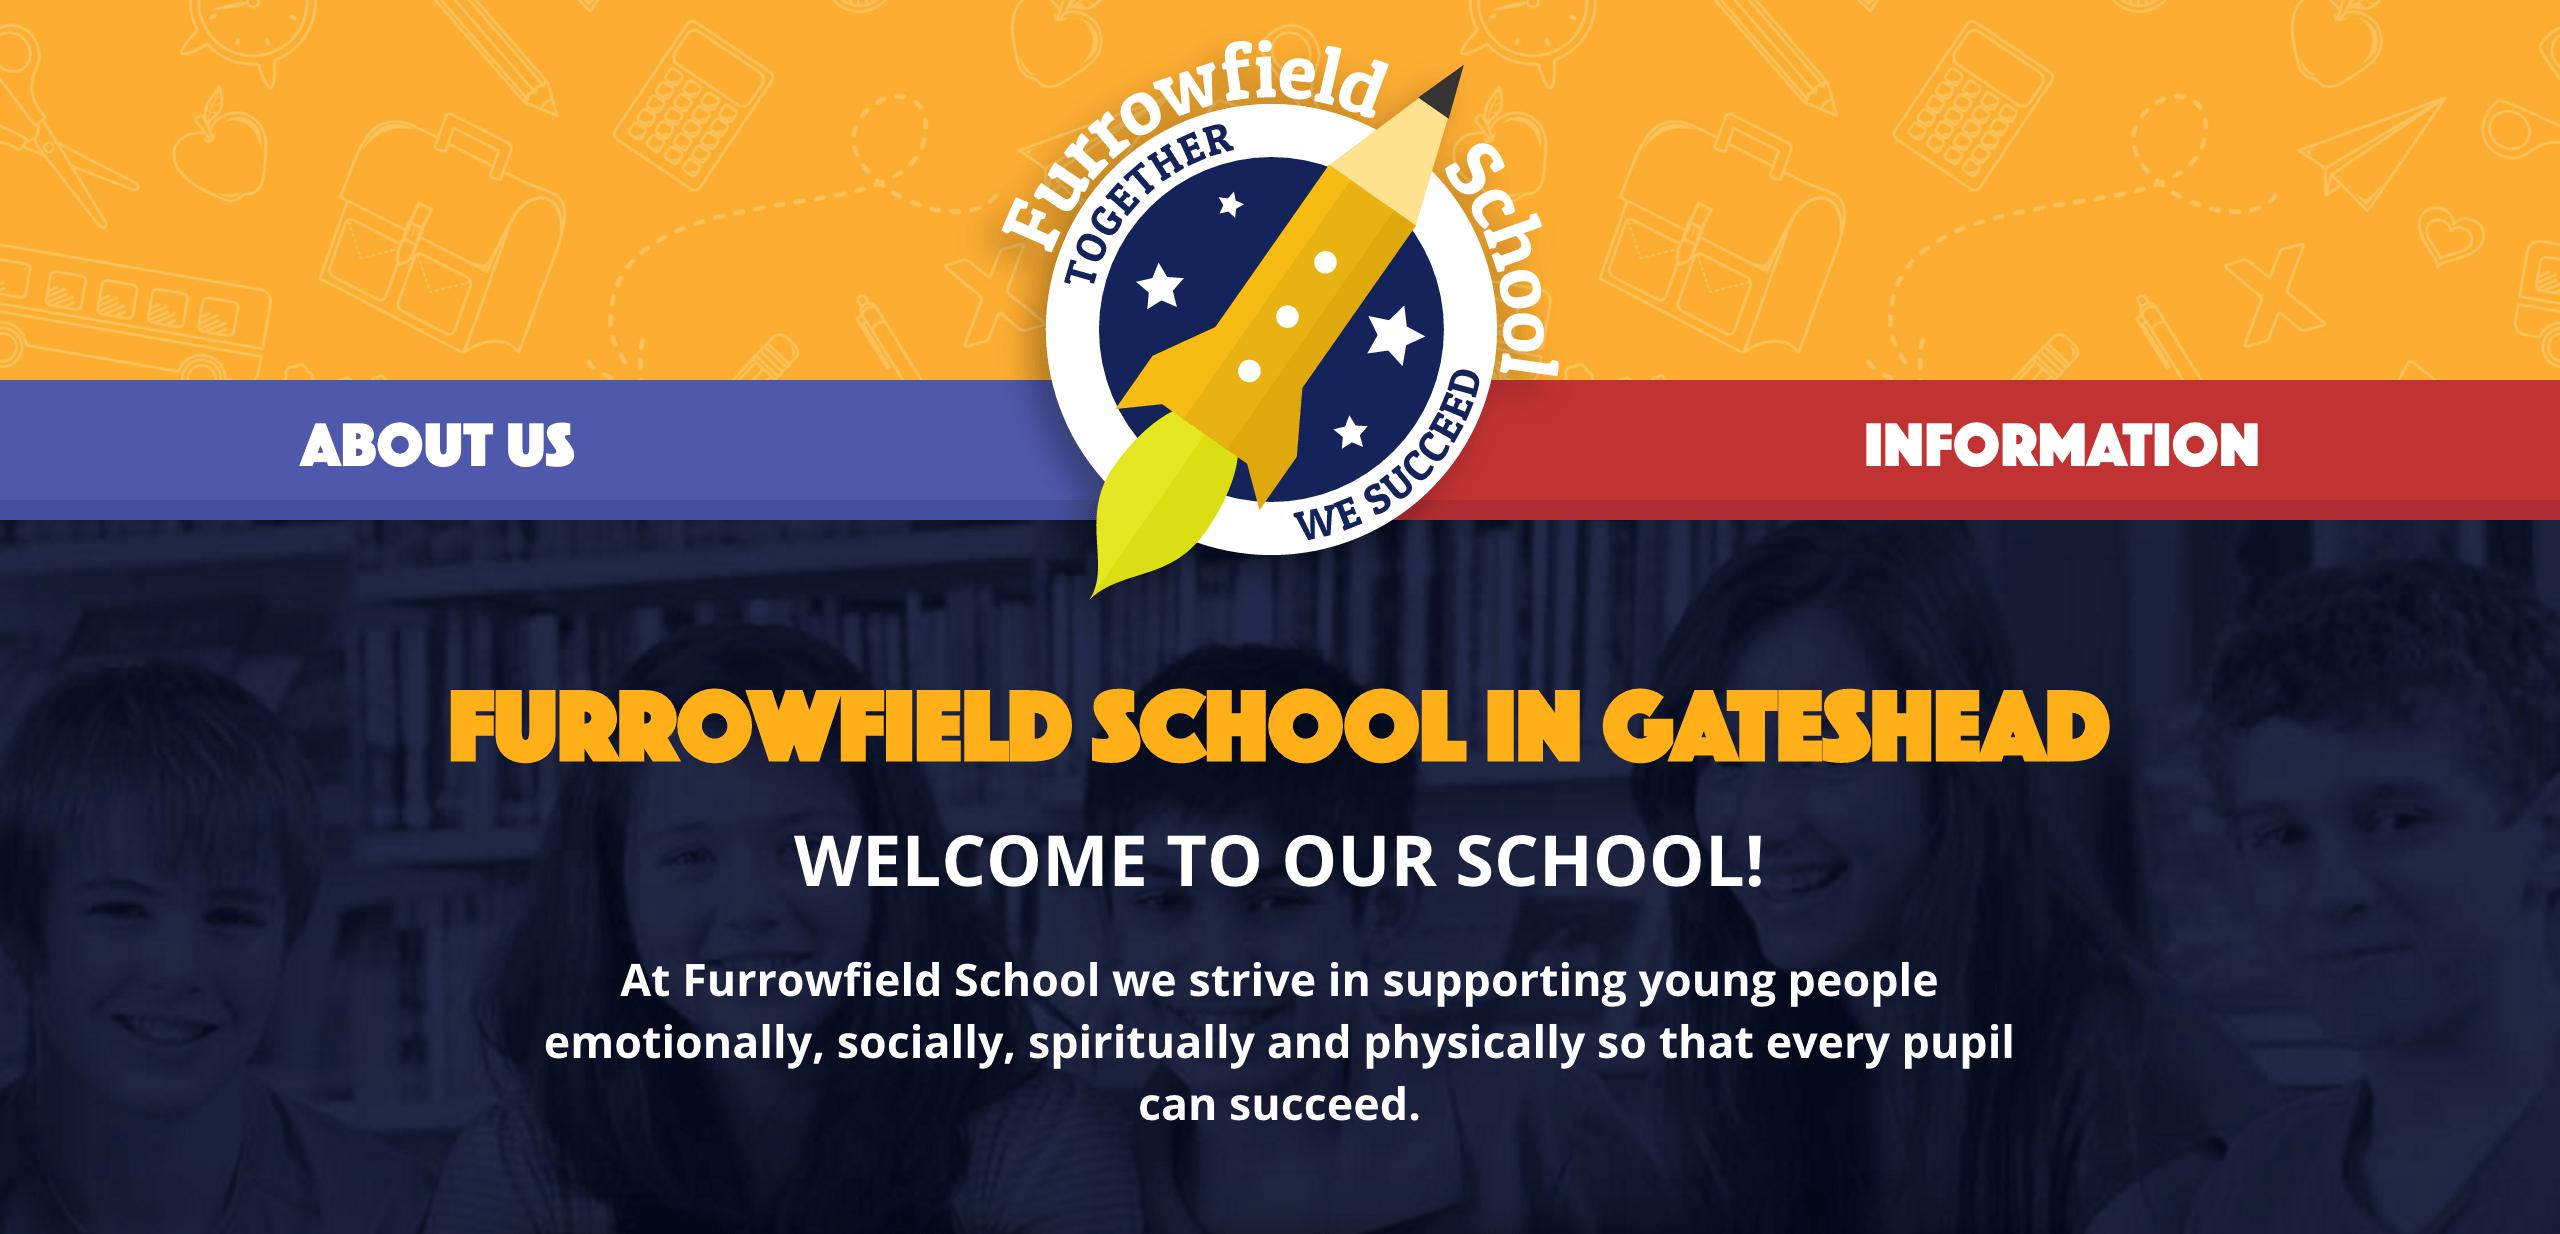 Furrowfield School Gateshead